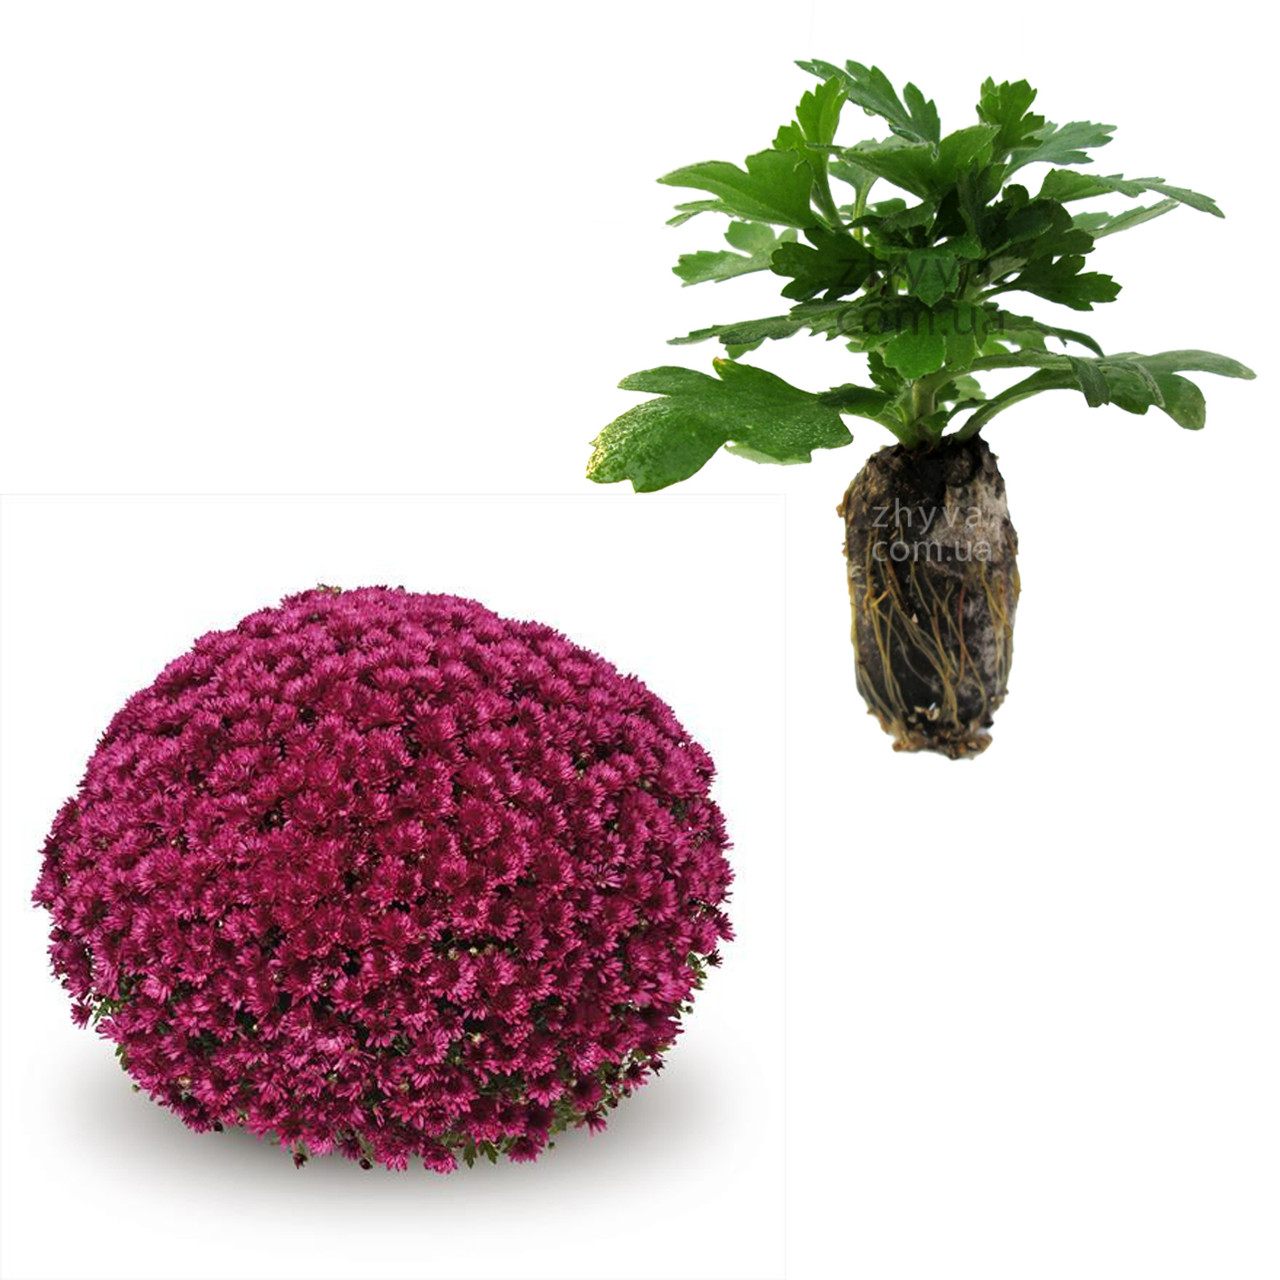 "Саджанці Хризантема Multiflora ""Cabalero Violet'' 1шт / Рассада Хризантема Multiflora ""Cabalero Violet''"